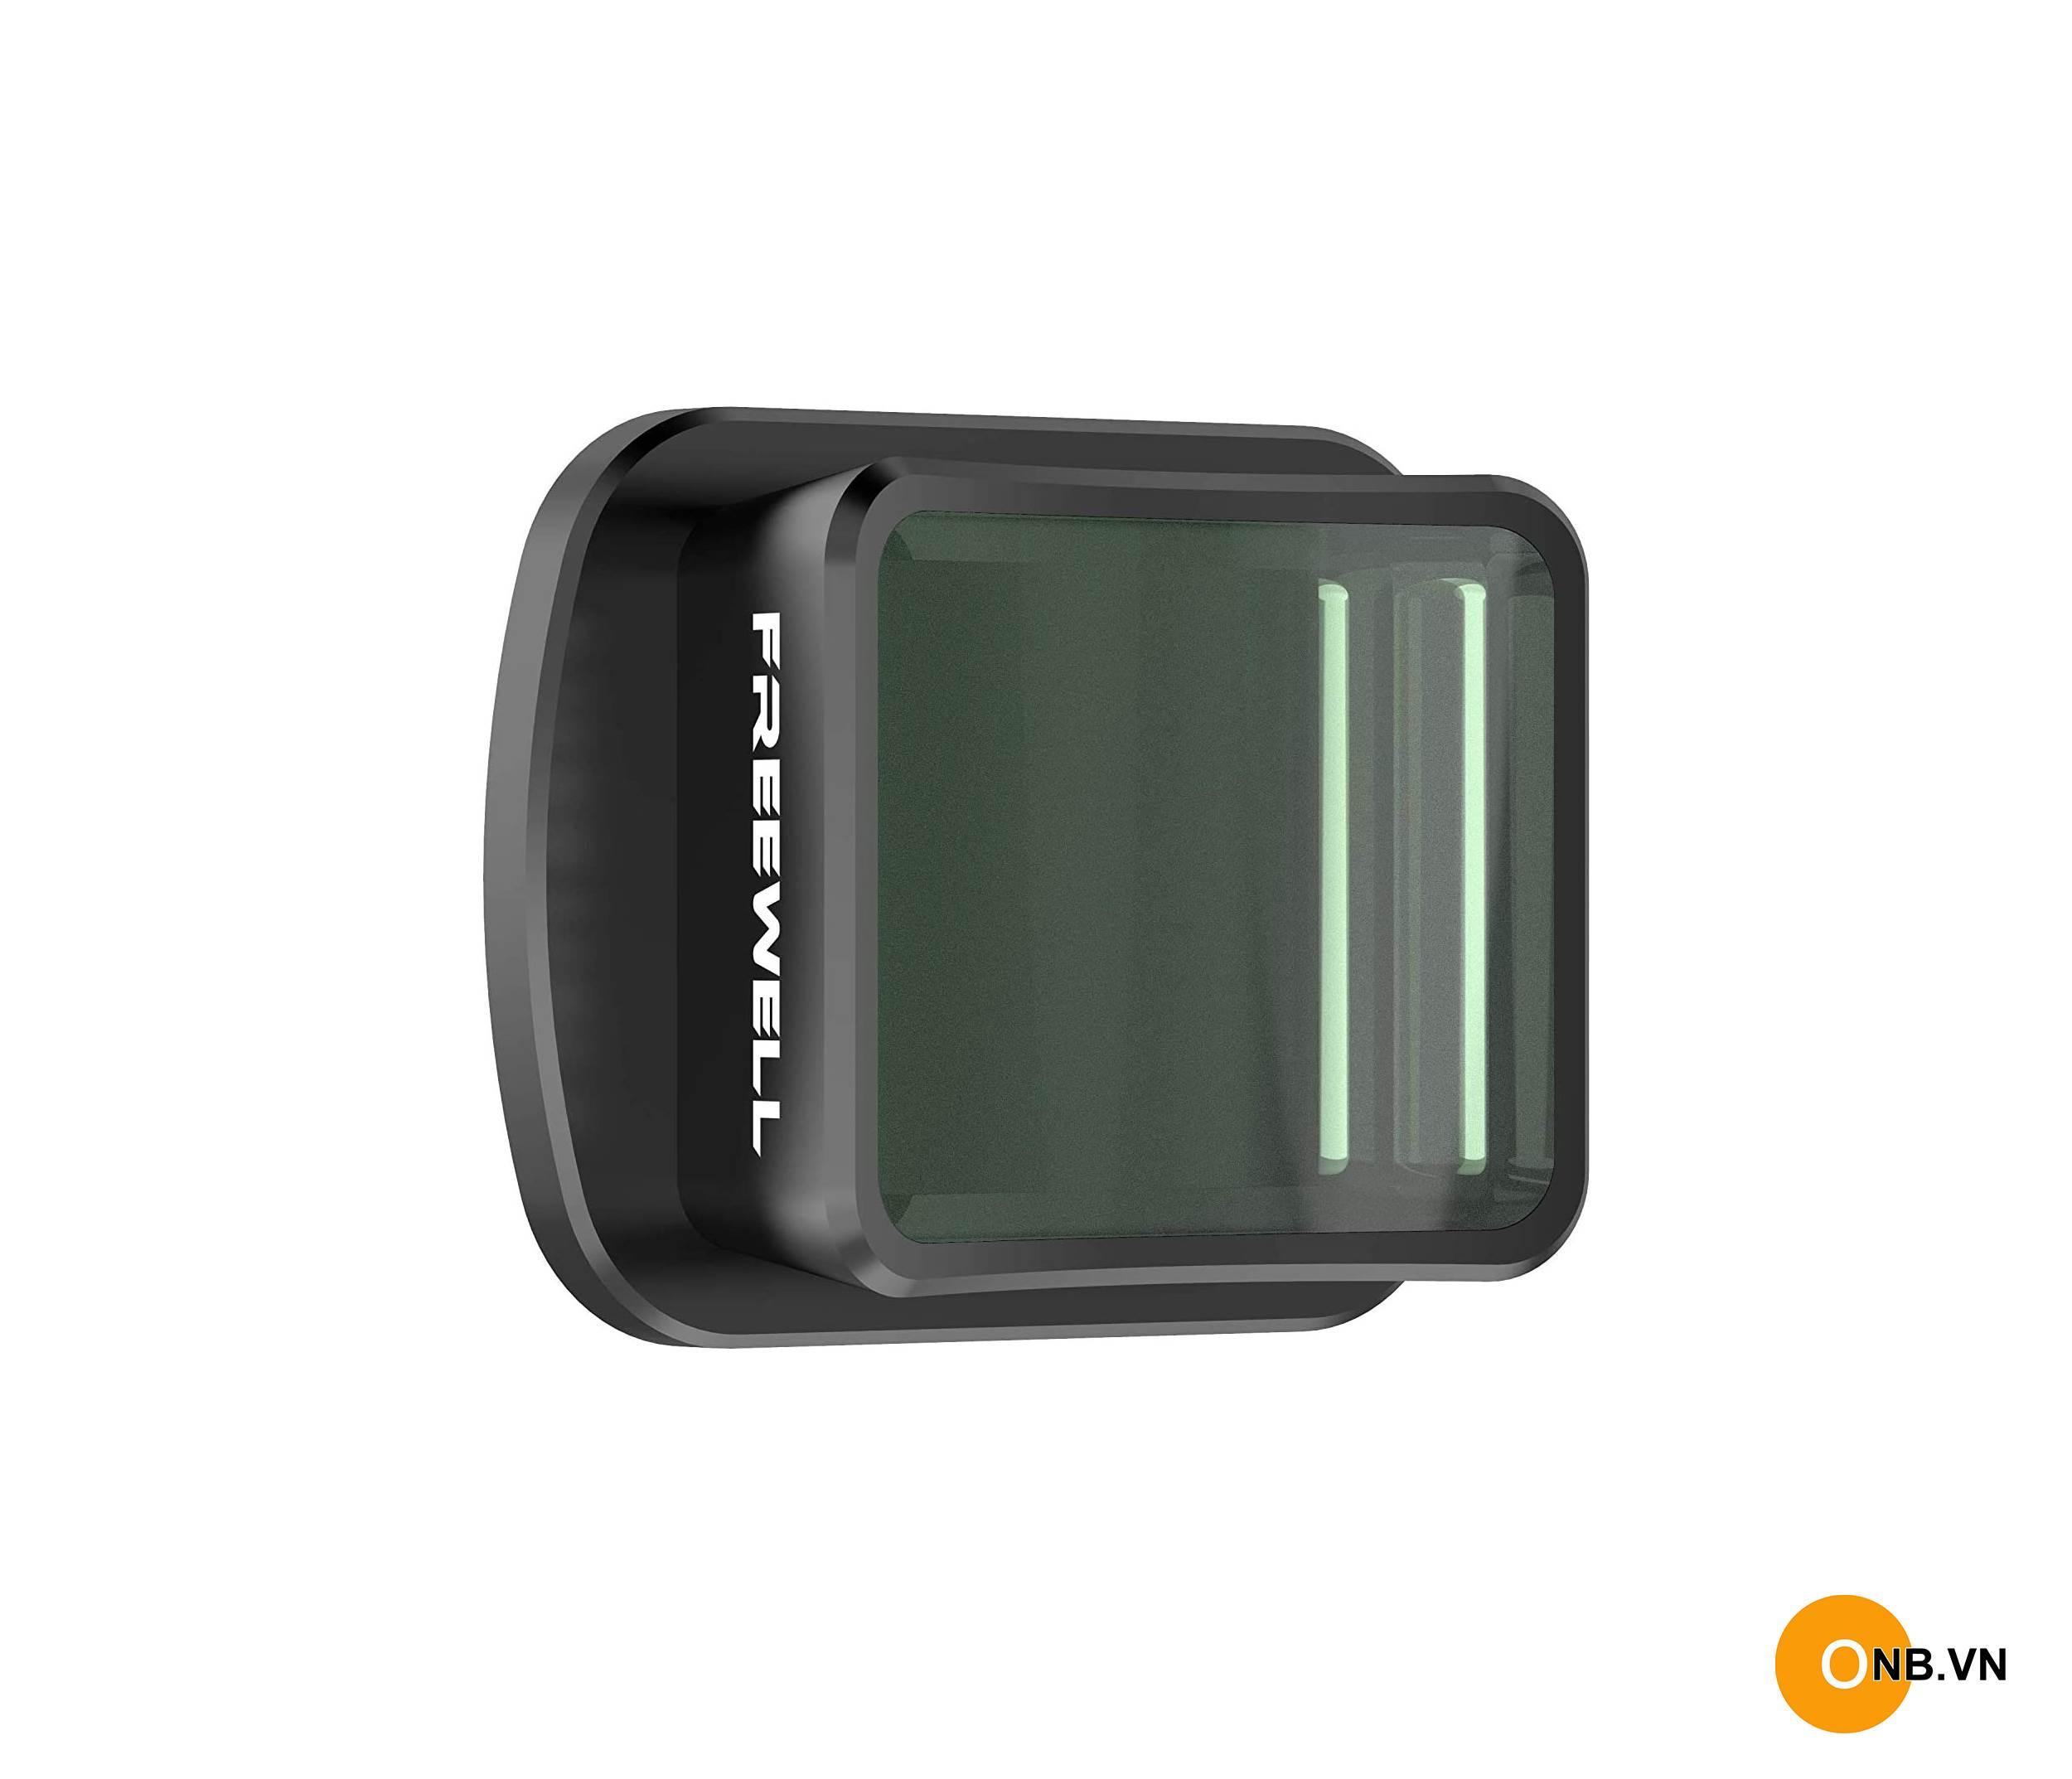 Freewell Osmo Pocket Anamorphic Lens quay cinematic chuẩn 21:9